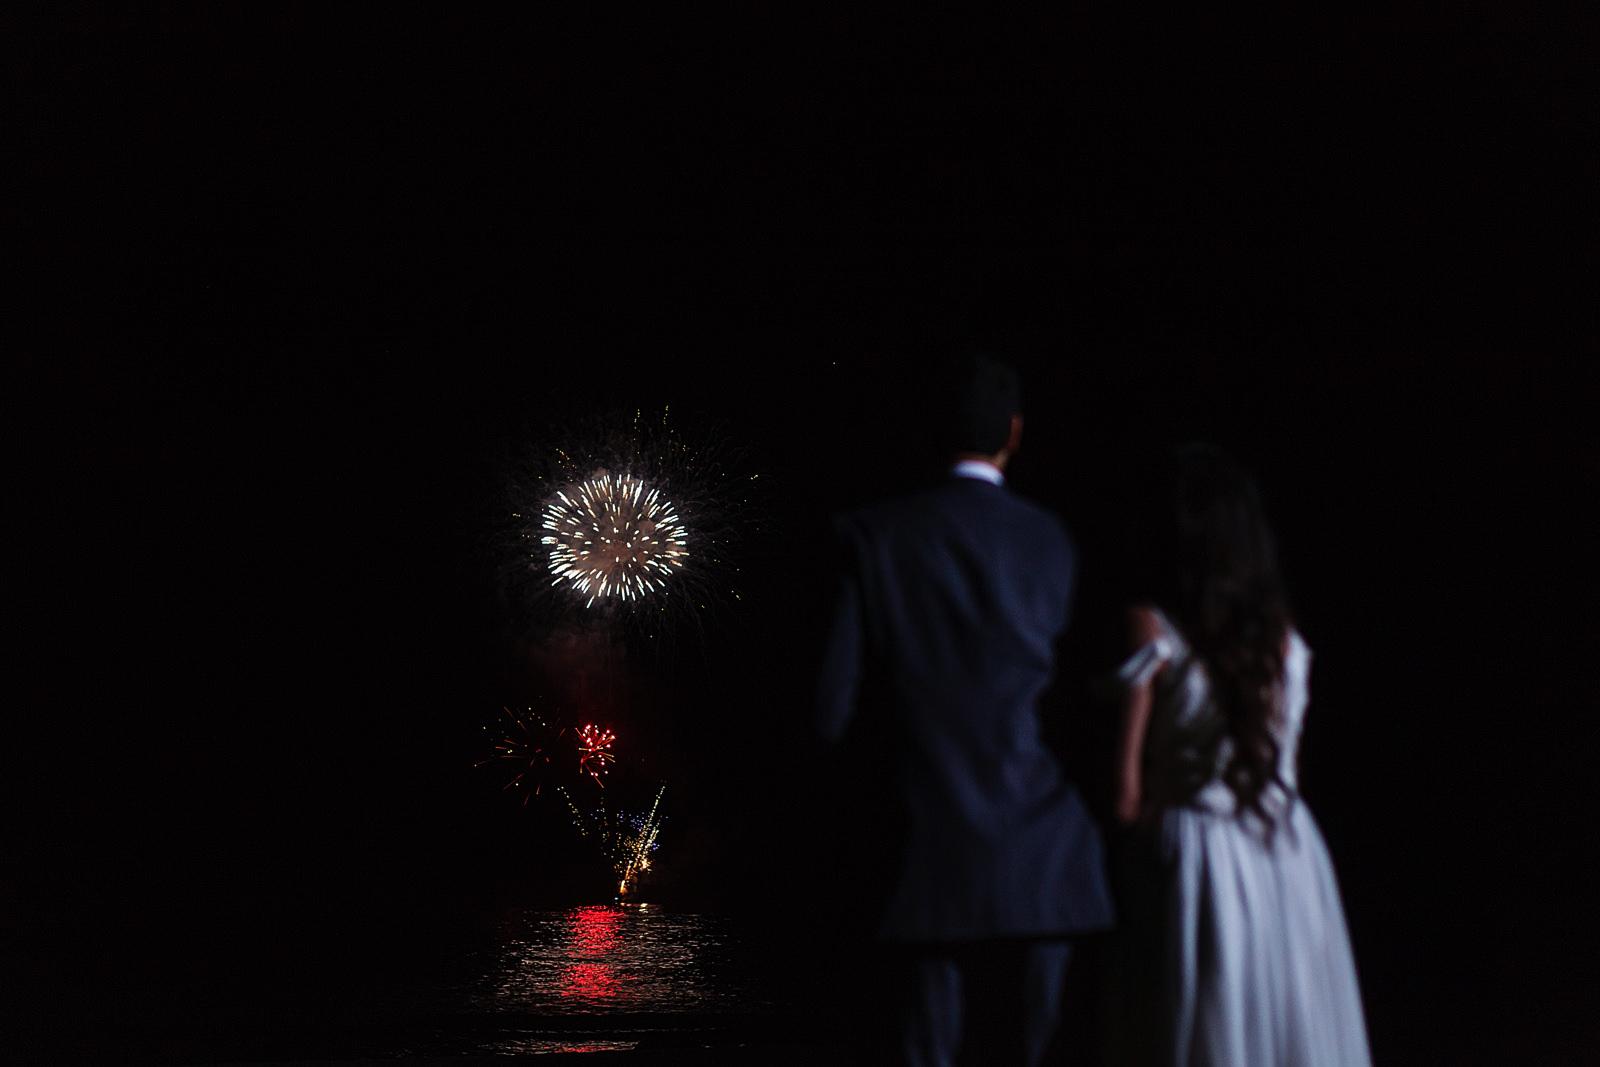 st-regis-punta-mita-wedding-fireworks